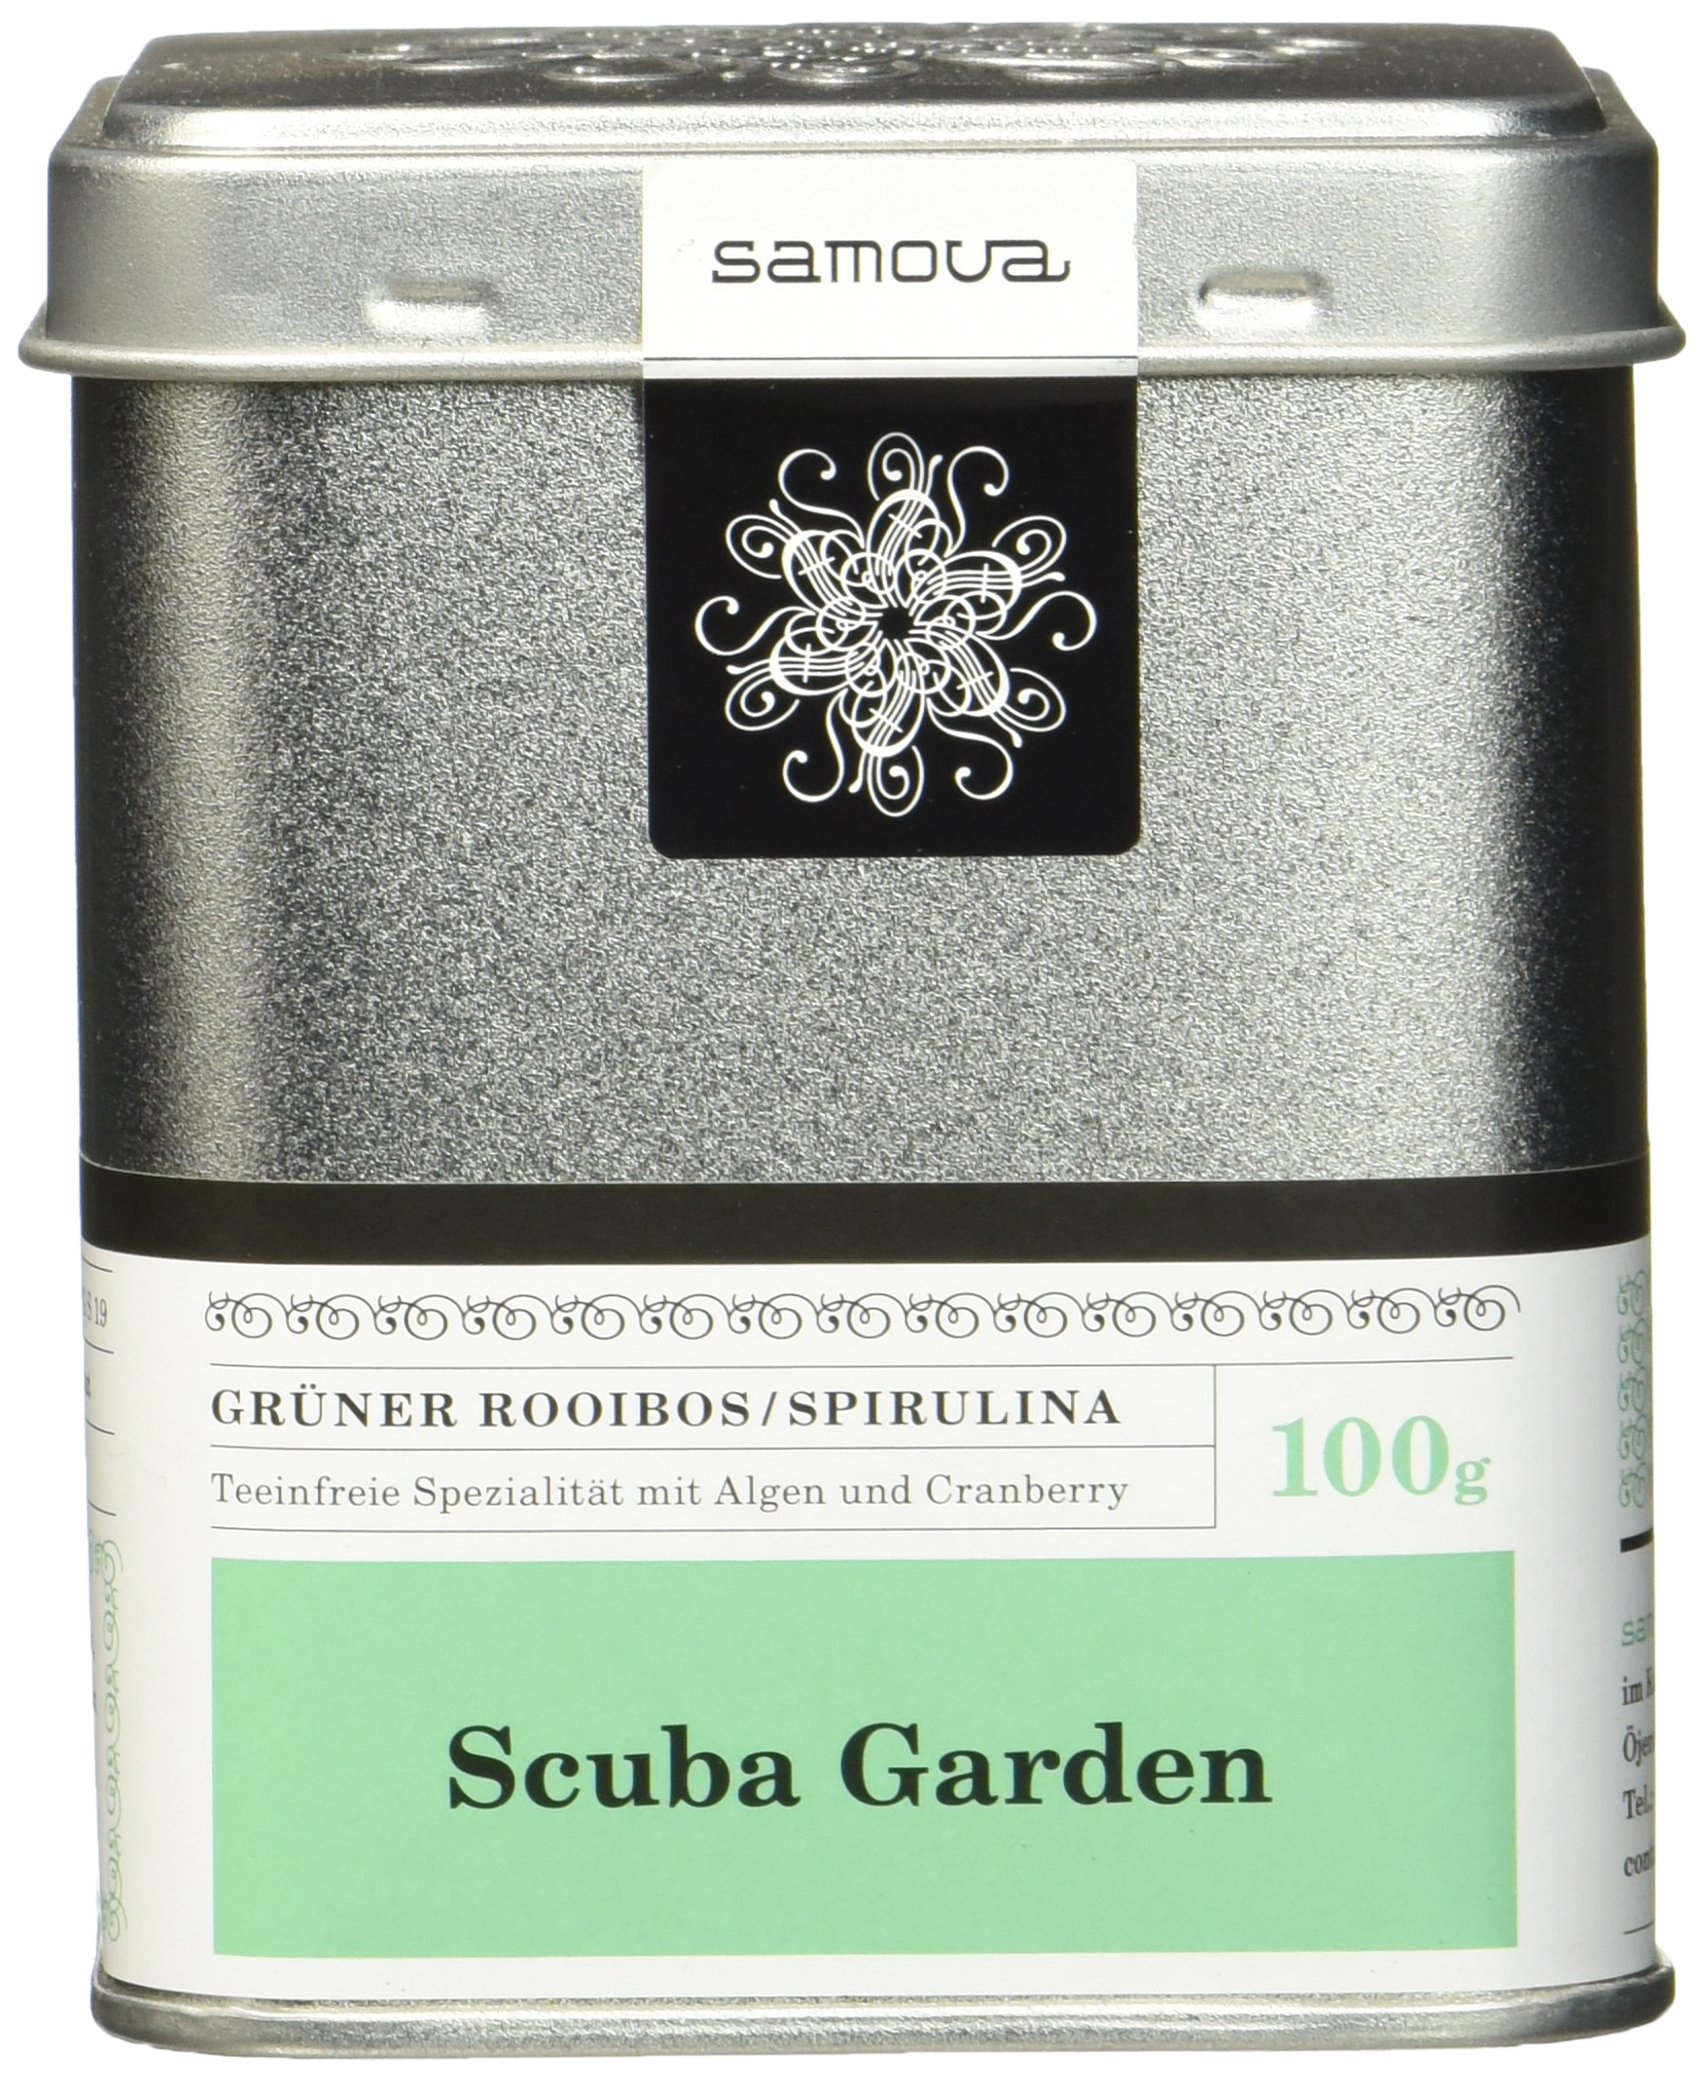 Samova-Scuba-Garden-Grner-RooibosSpirulina-100g-1er-Pack-1-x-100-g